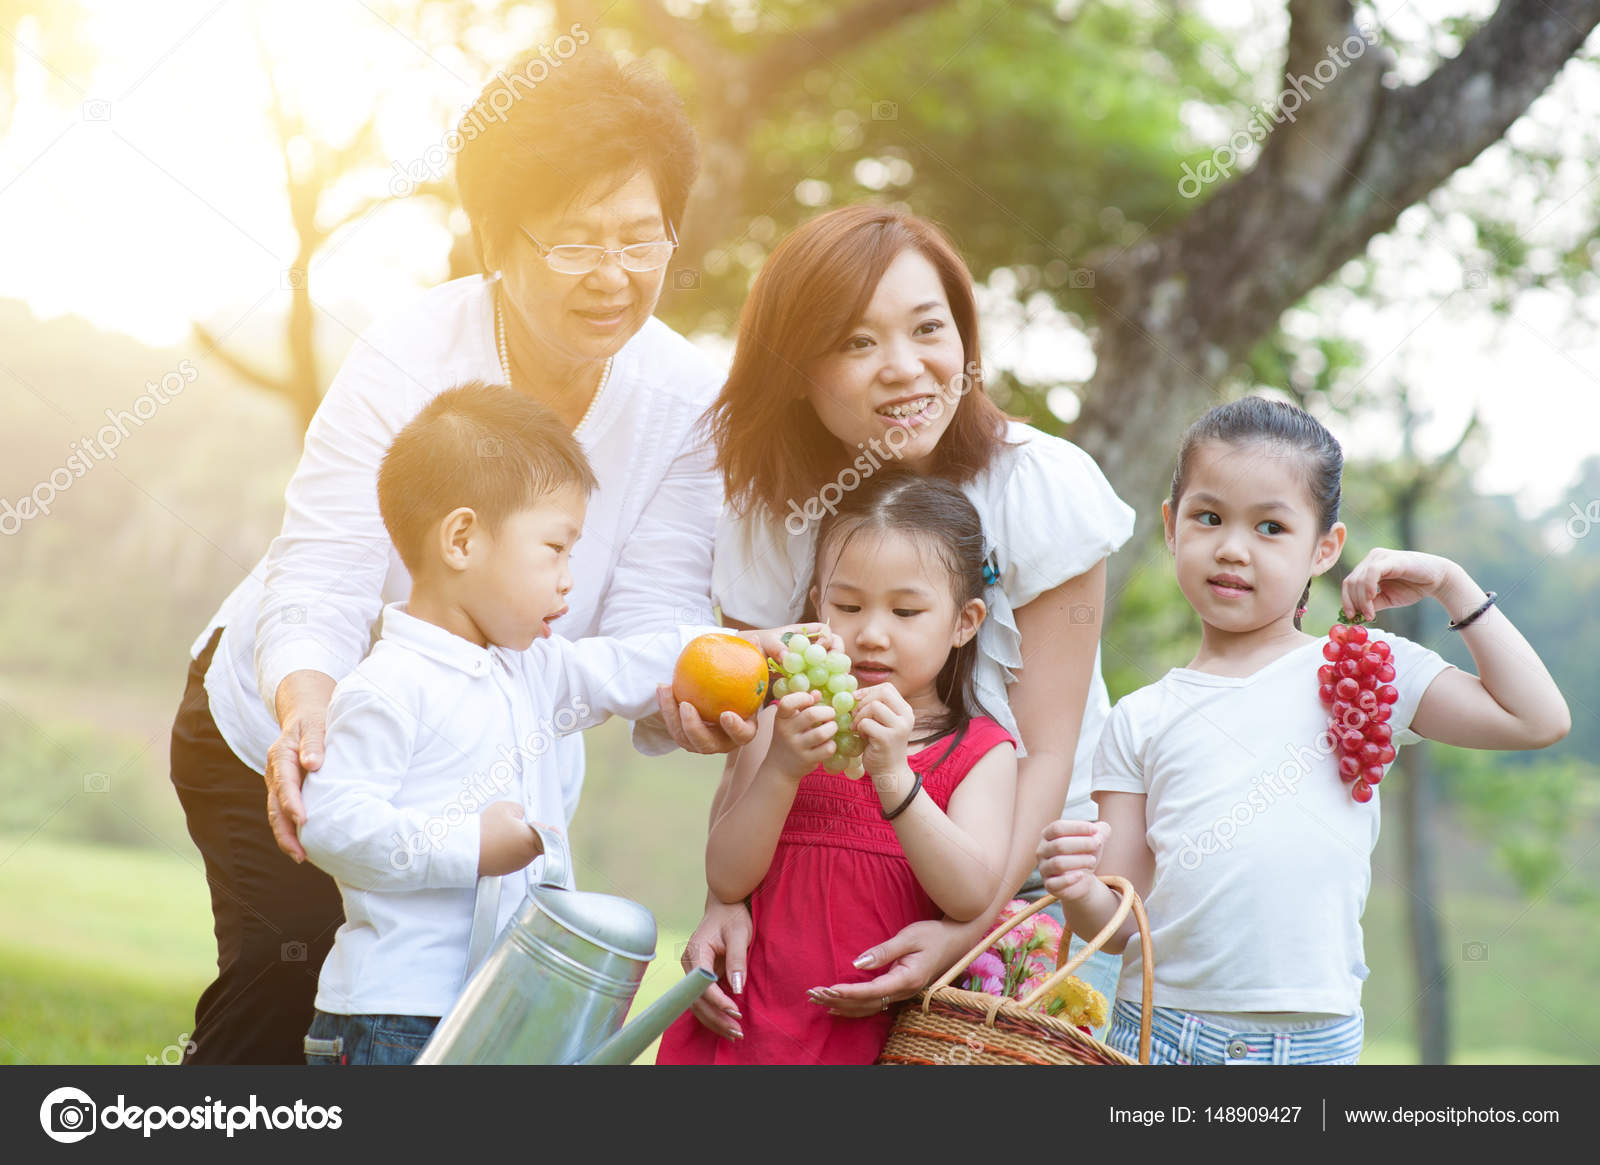 21d13228a8f Αυθεντικές πορτρέτο της χαρούμενη πολλαπλών γενεών ασιατικής οικογένειας  στο πάρκο. Γιαγιά, μητέρα και εγγόνια υπαίθρια διασκέδαση. Το πρωί ήλιος  φωτοβολίδα ...